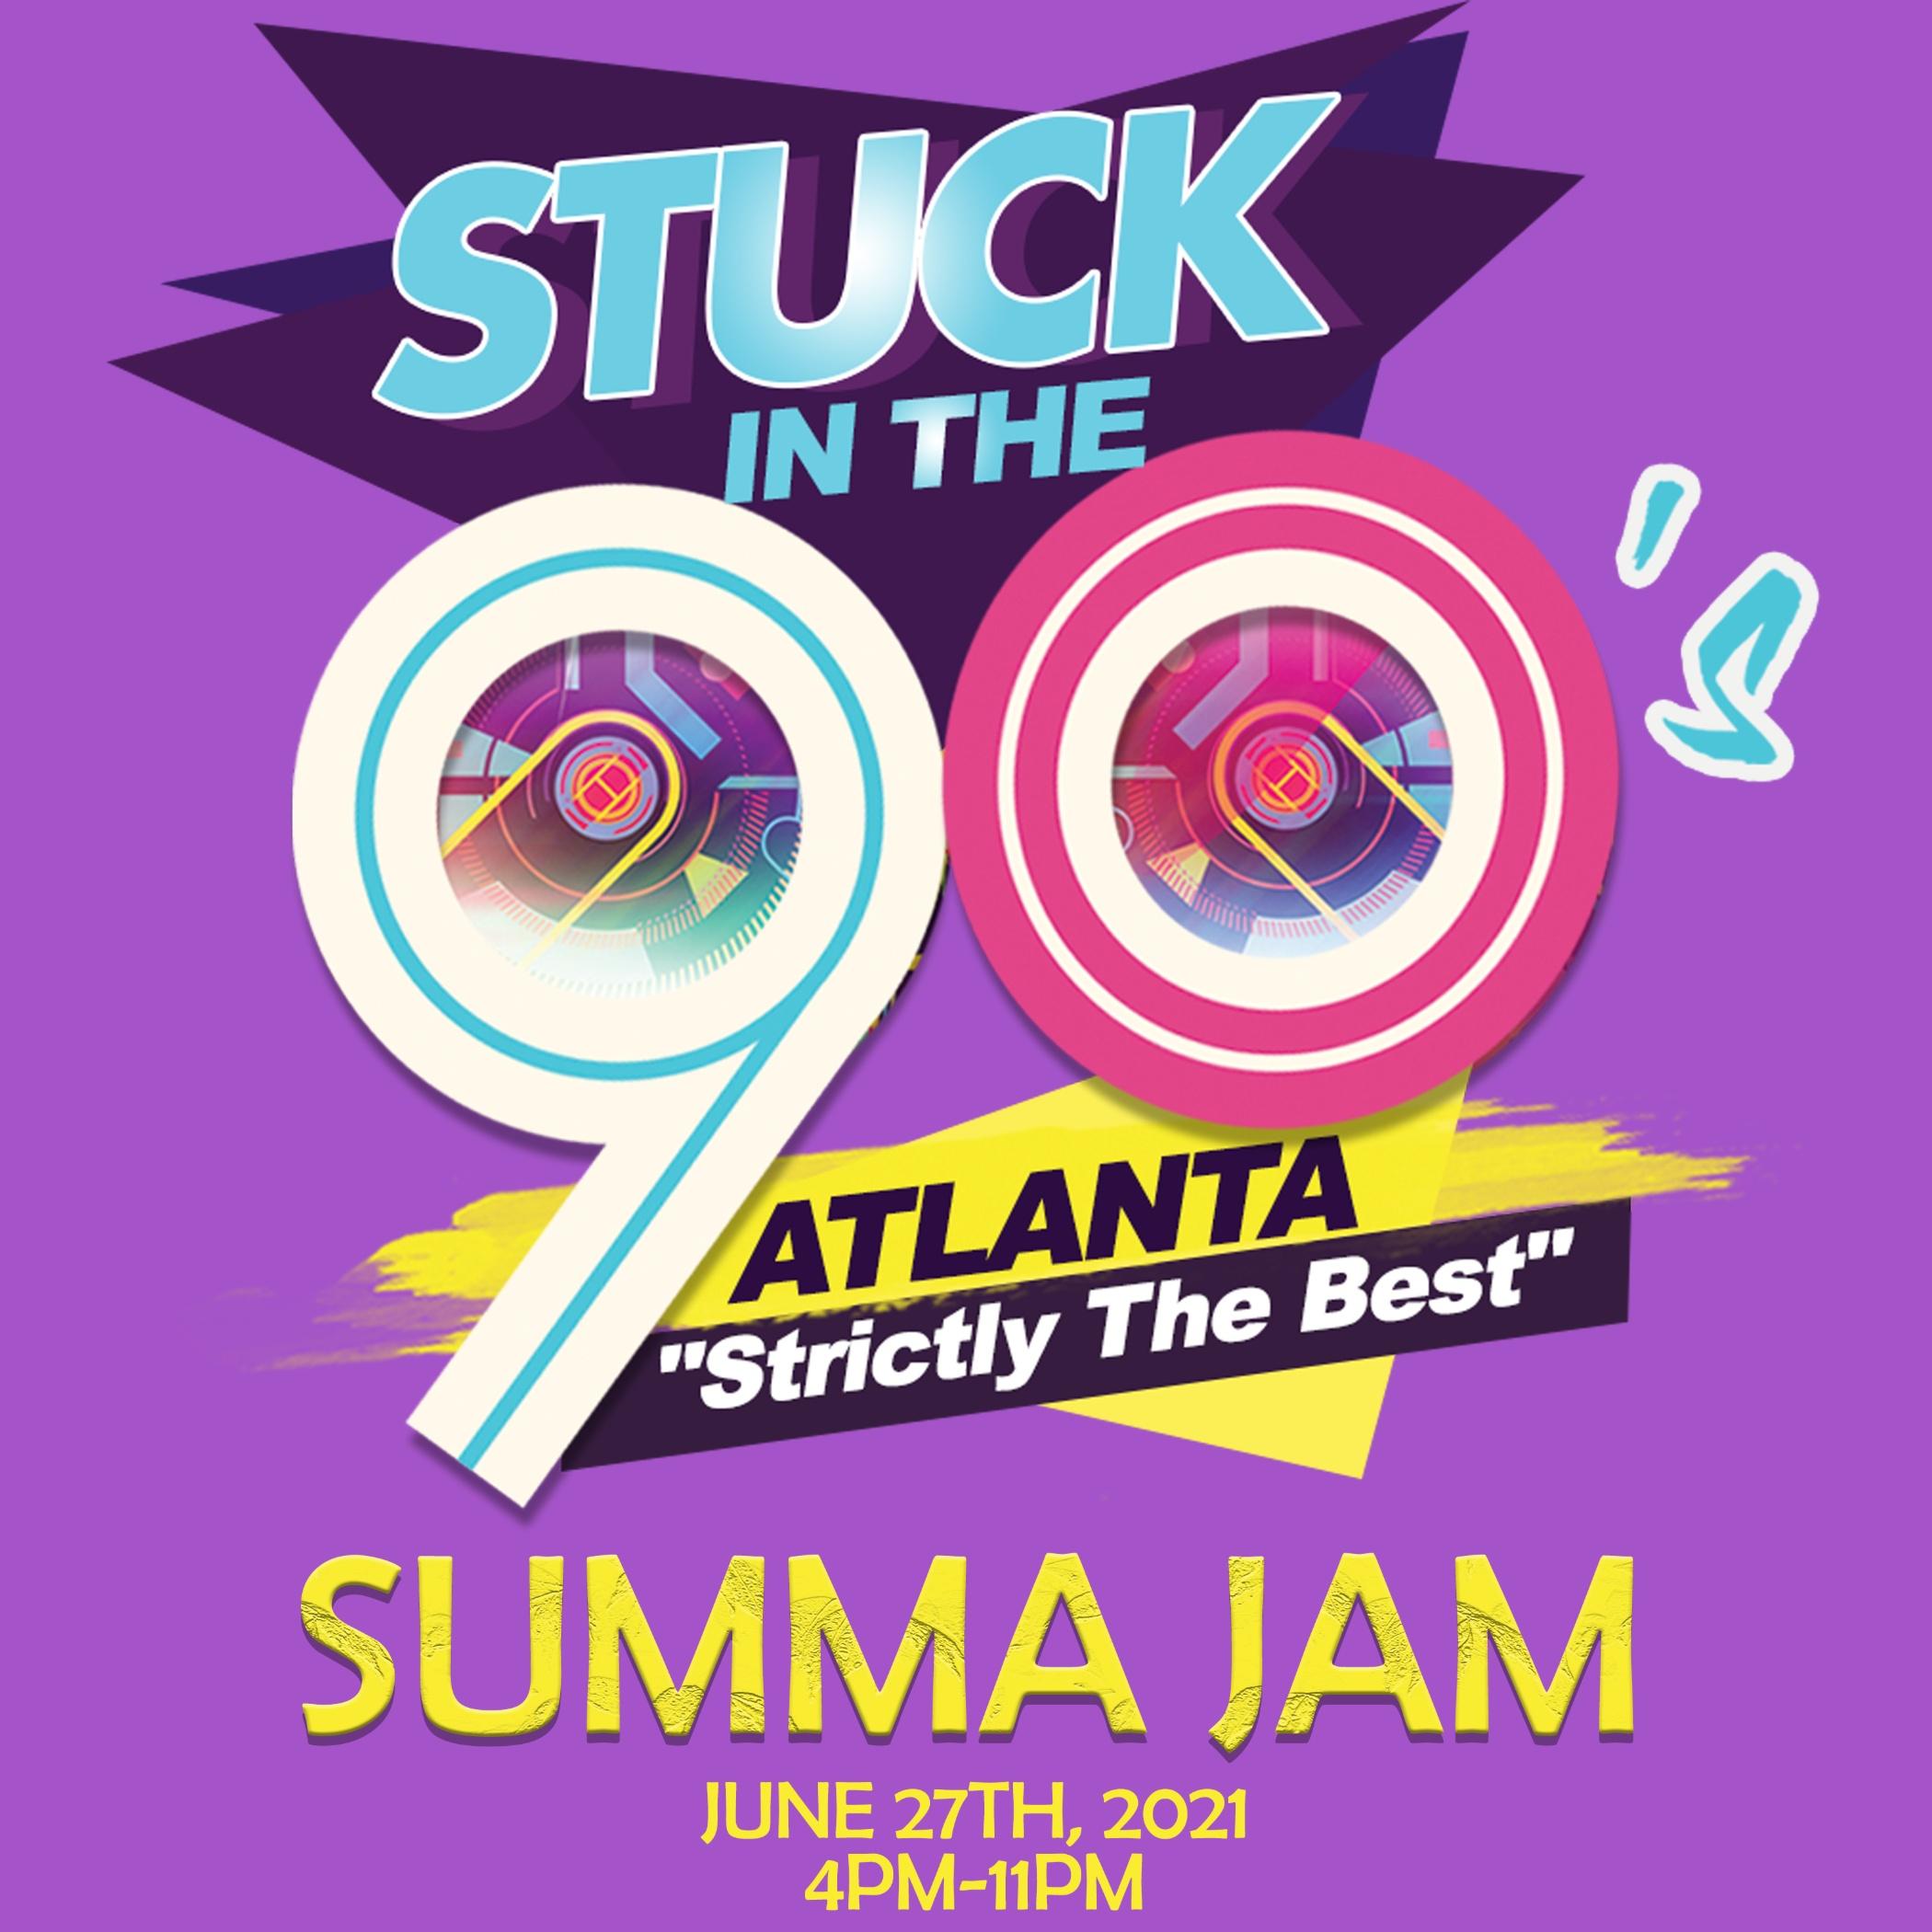 Stuck In The 90s - Summa Jam